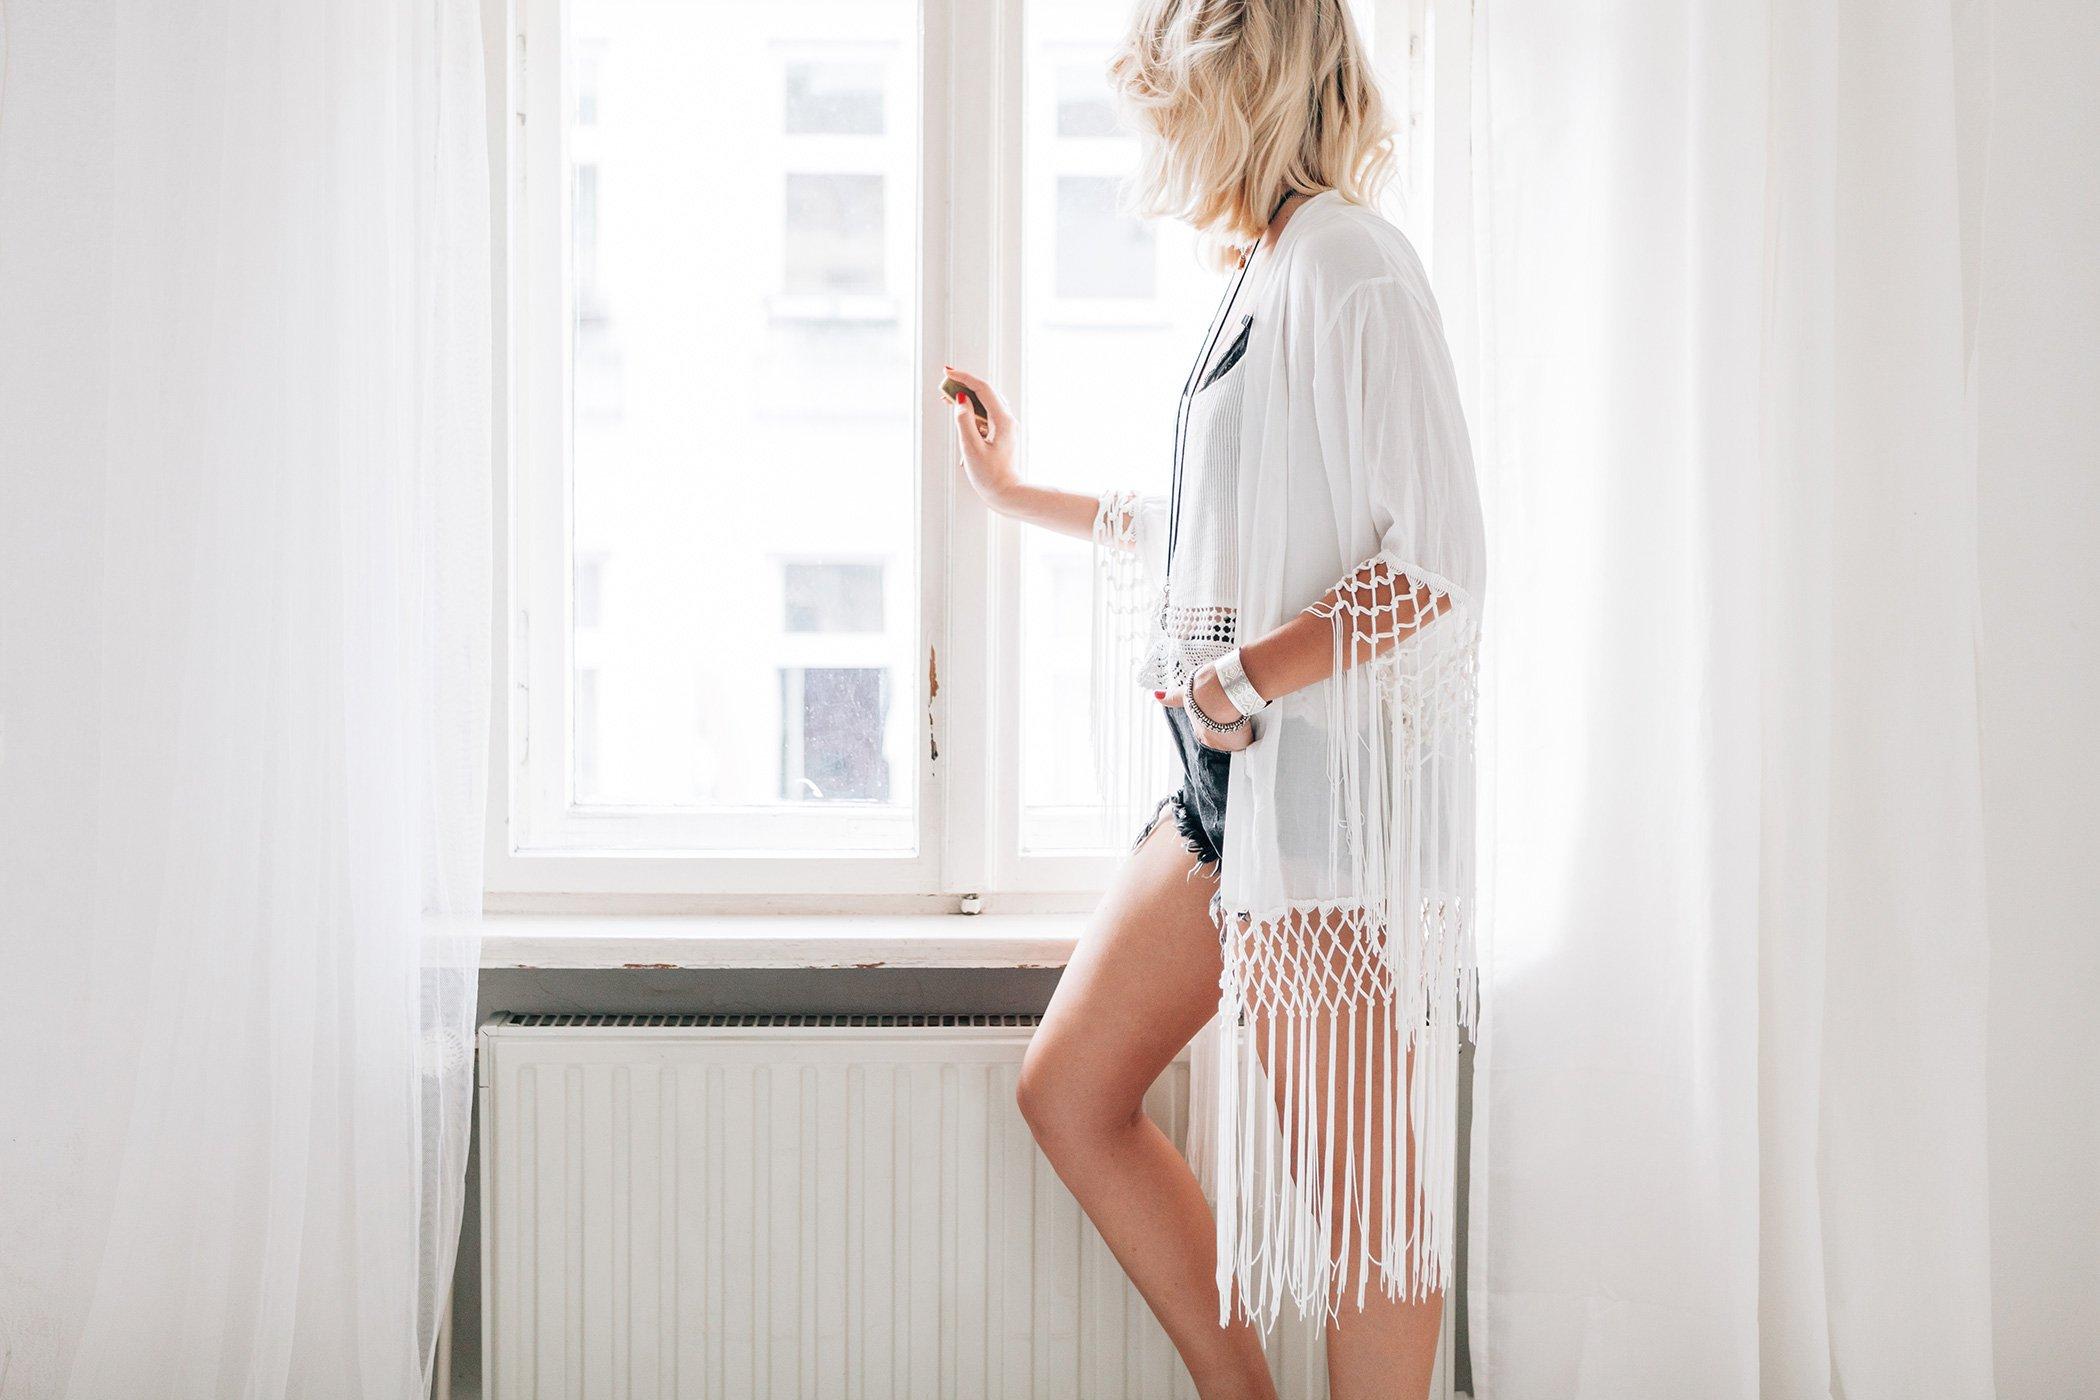 mikuta-wearing-white-kimono-and-shorts-7